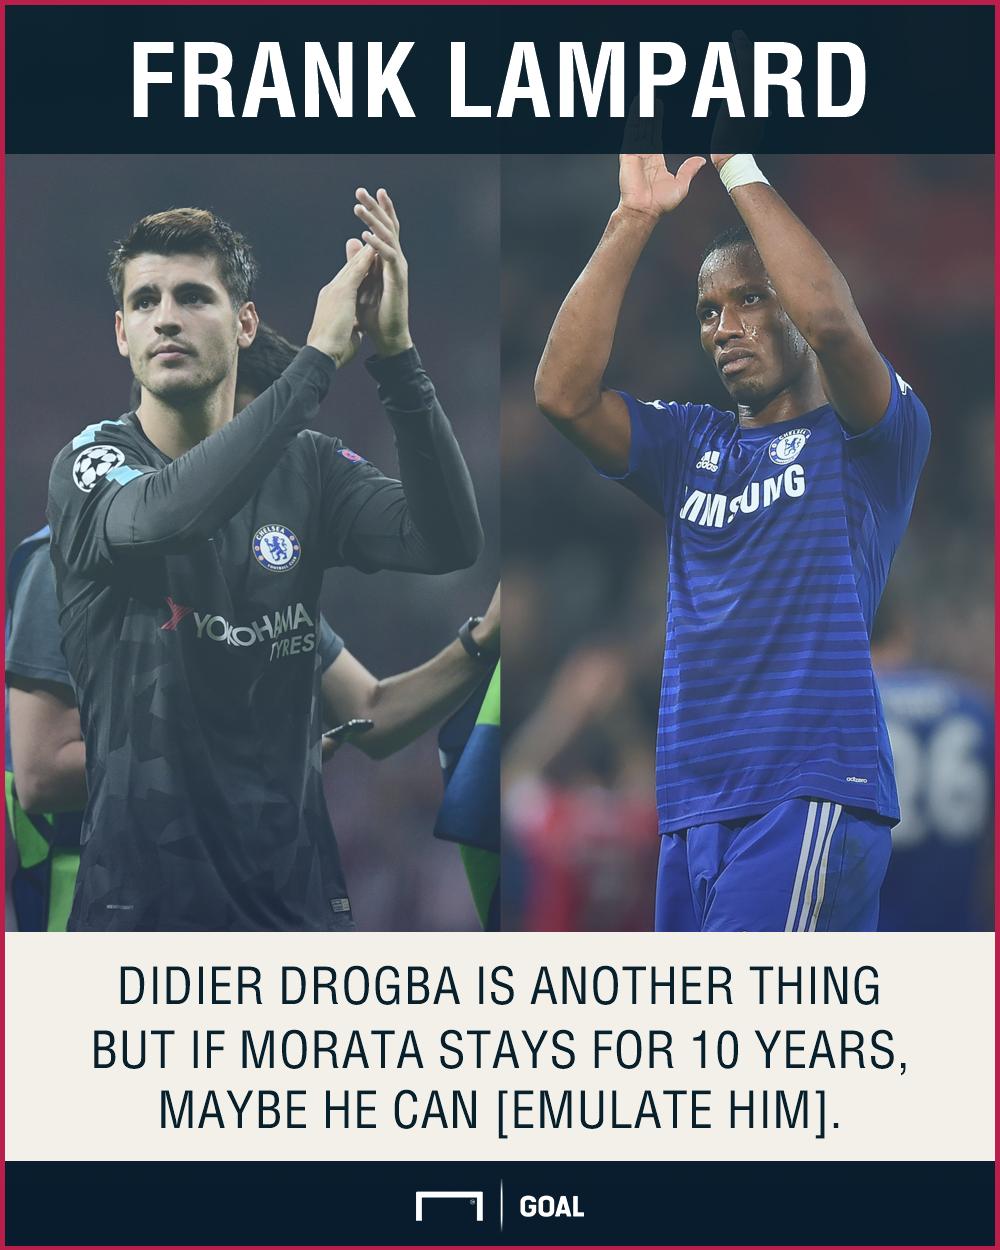 Didier Drogba Alvaro Morata Frank Lampard Chelsea